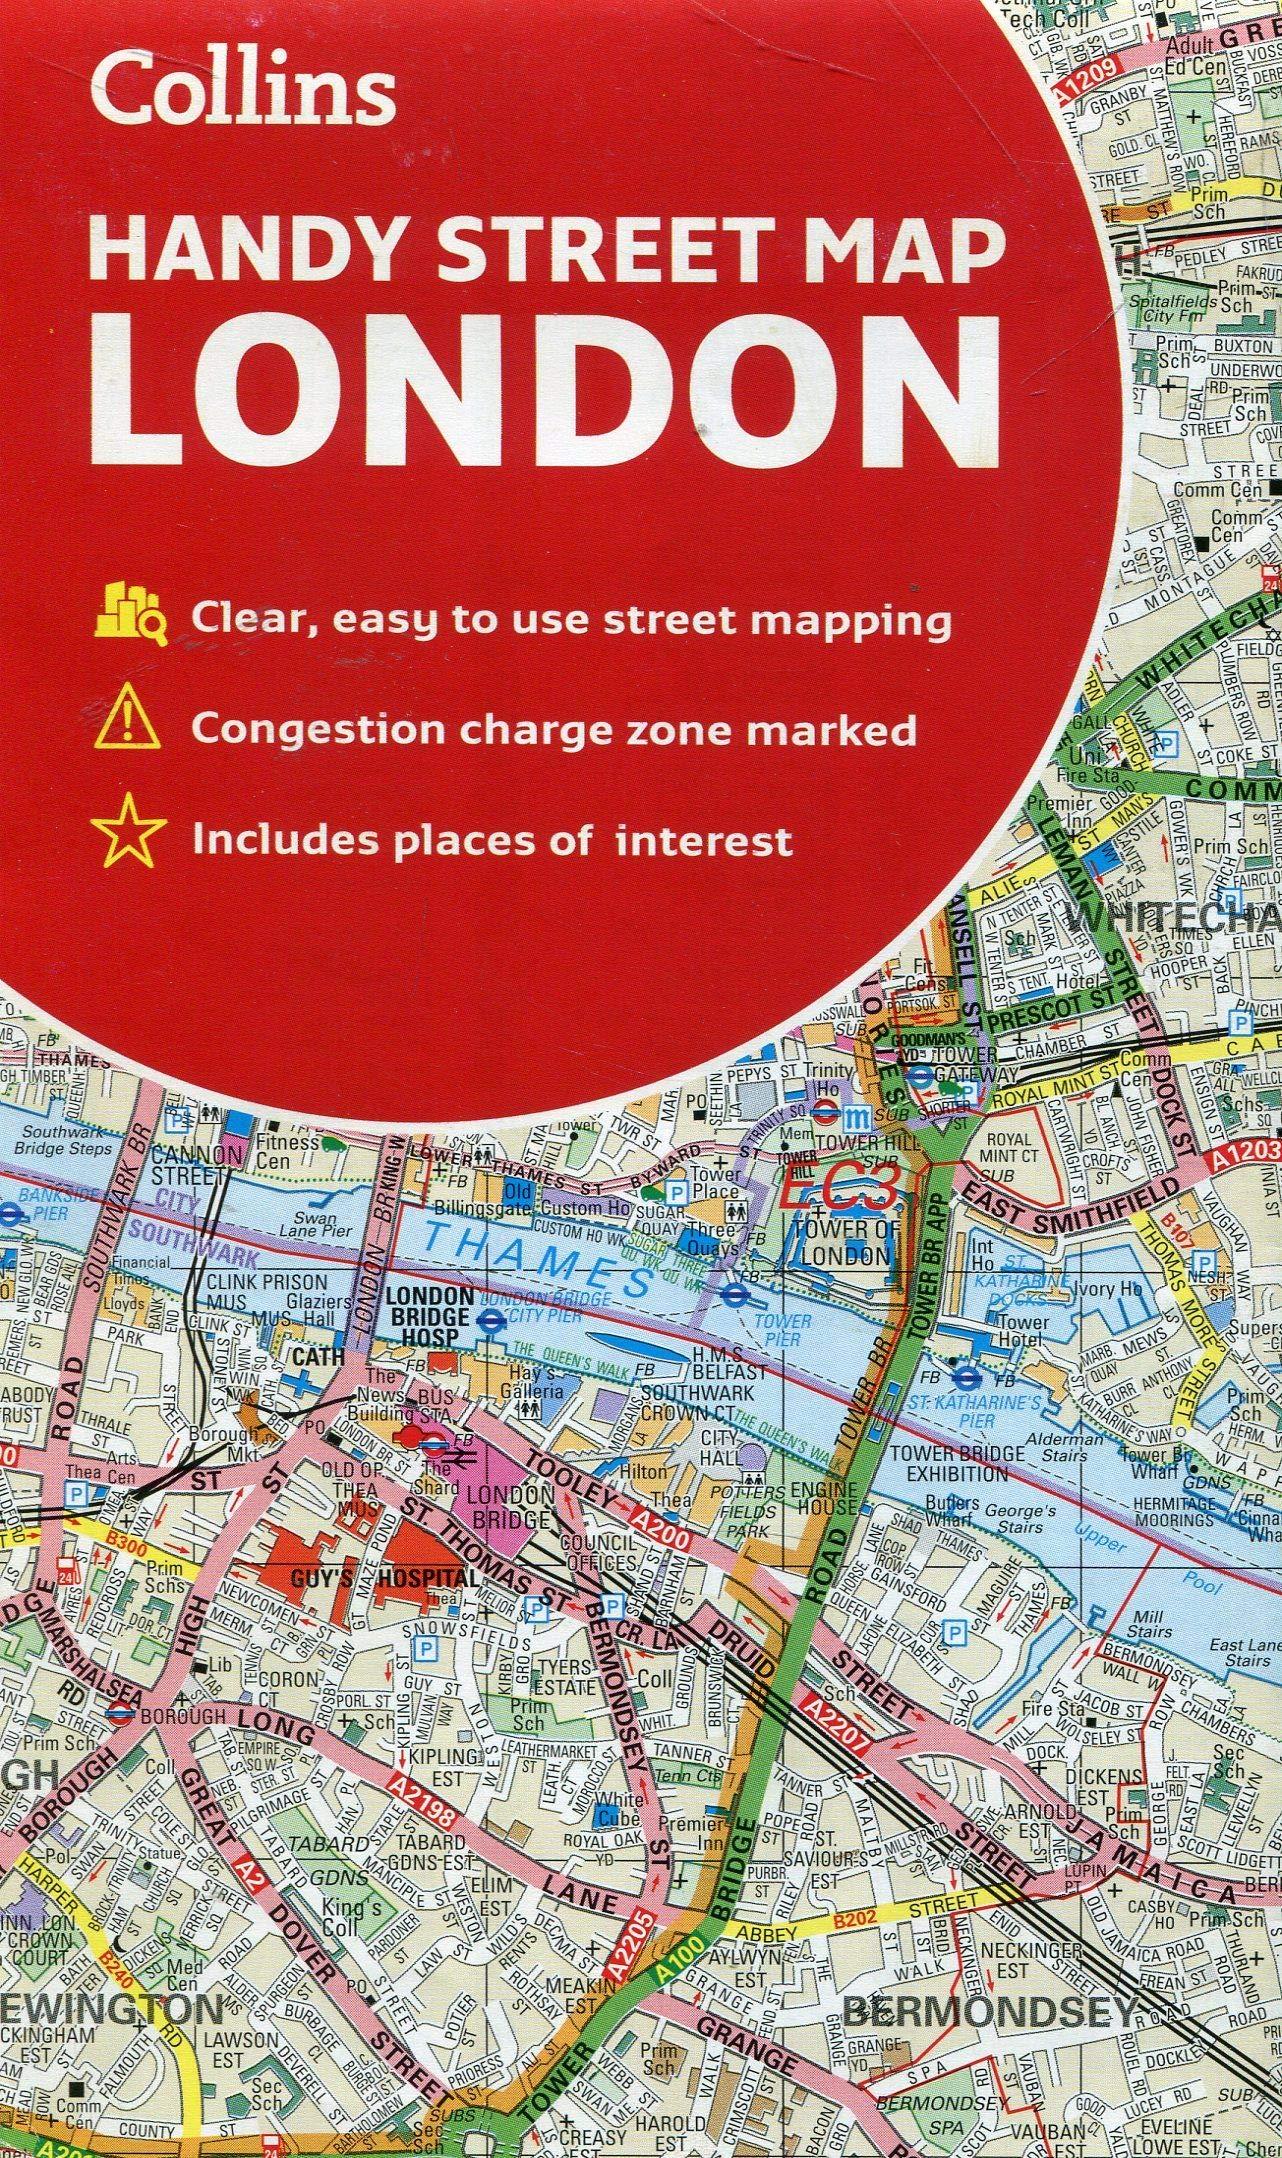 Collins London Handy Street Map por Collins Maps